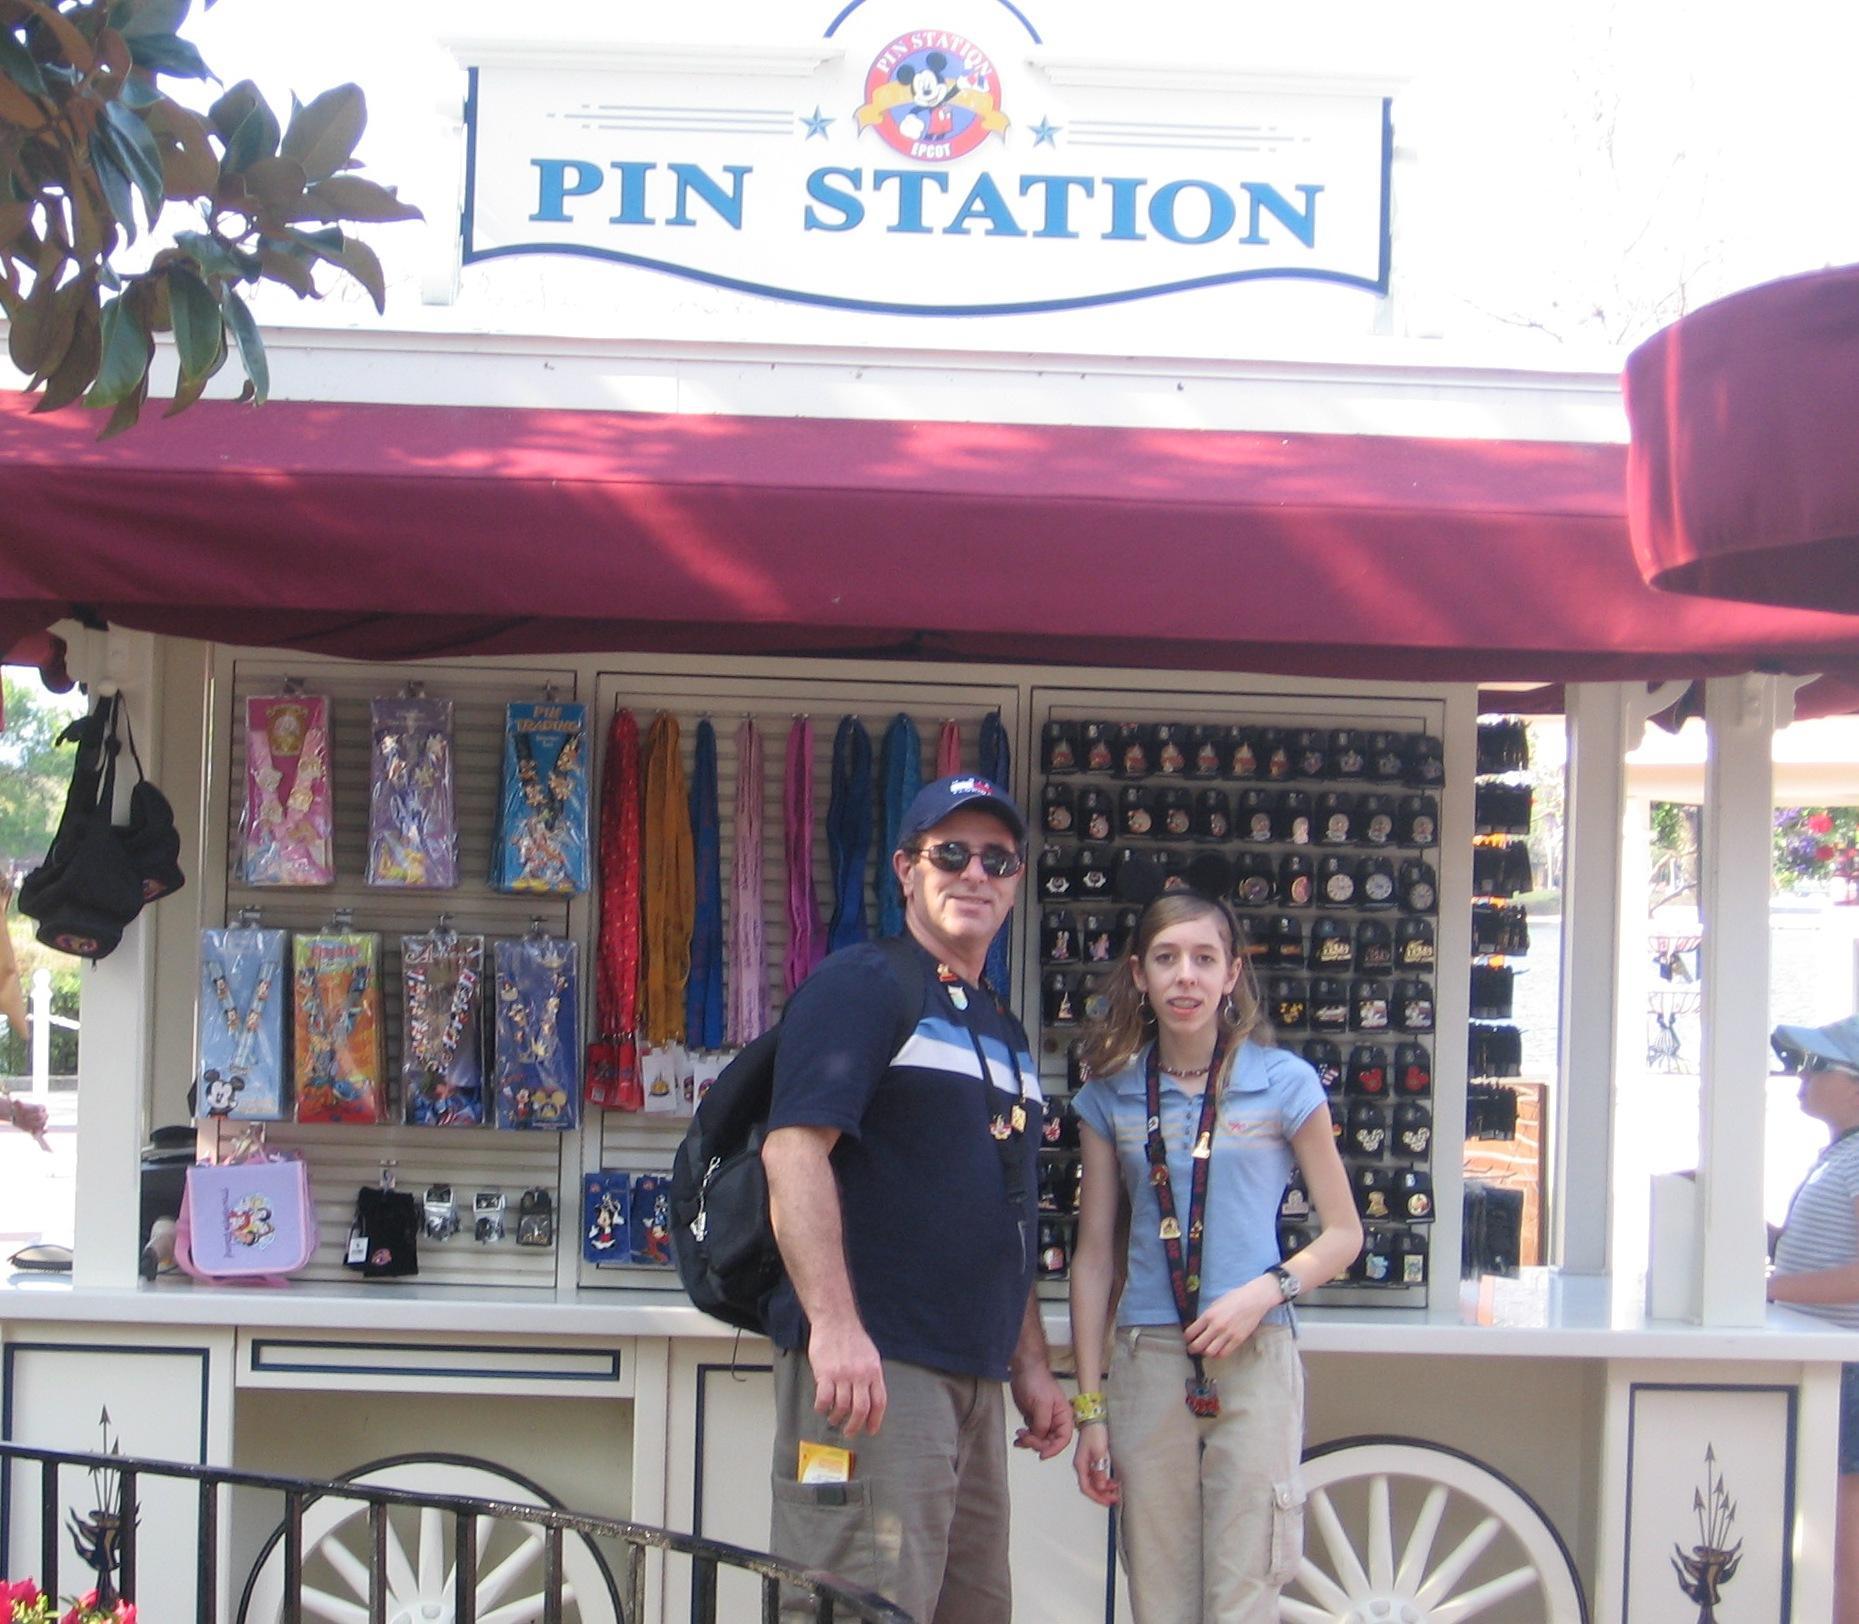 Pin station